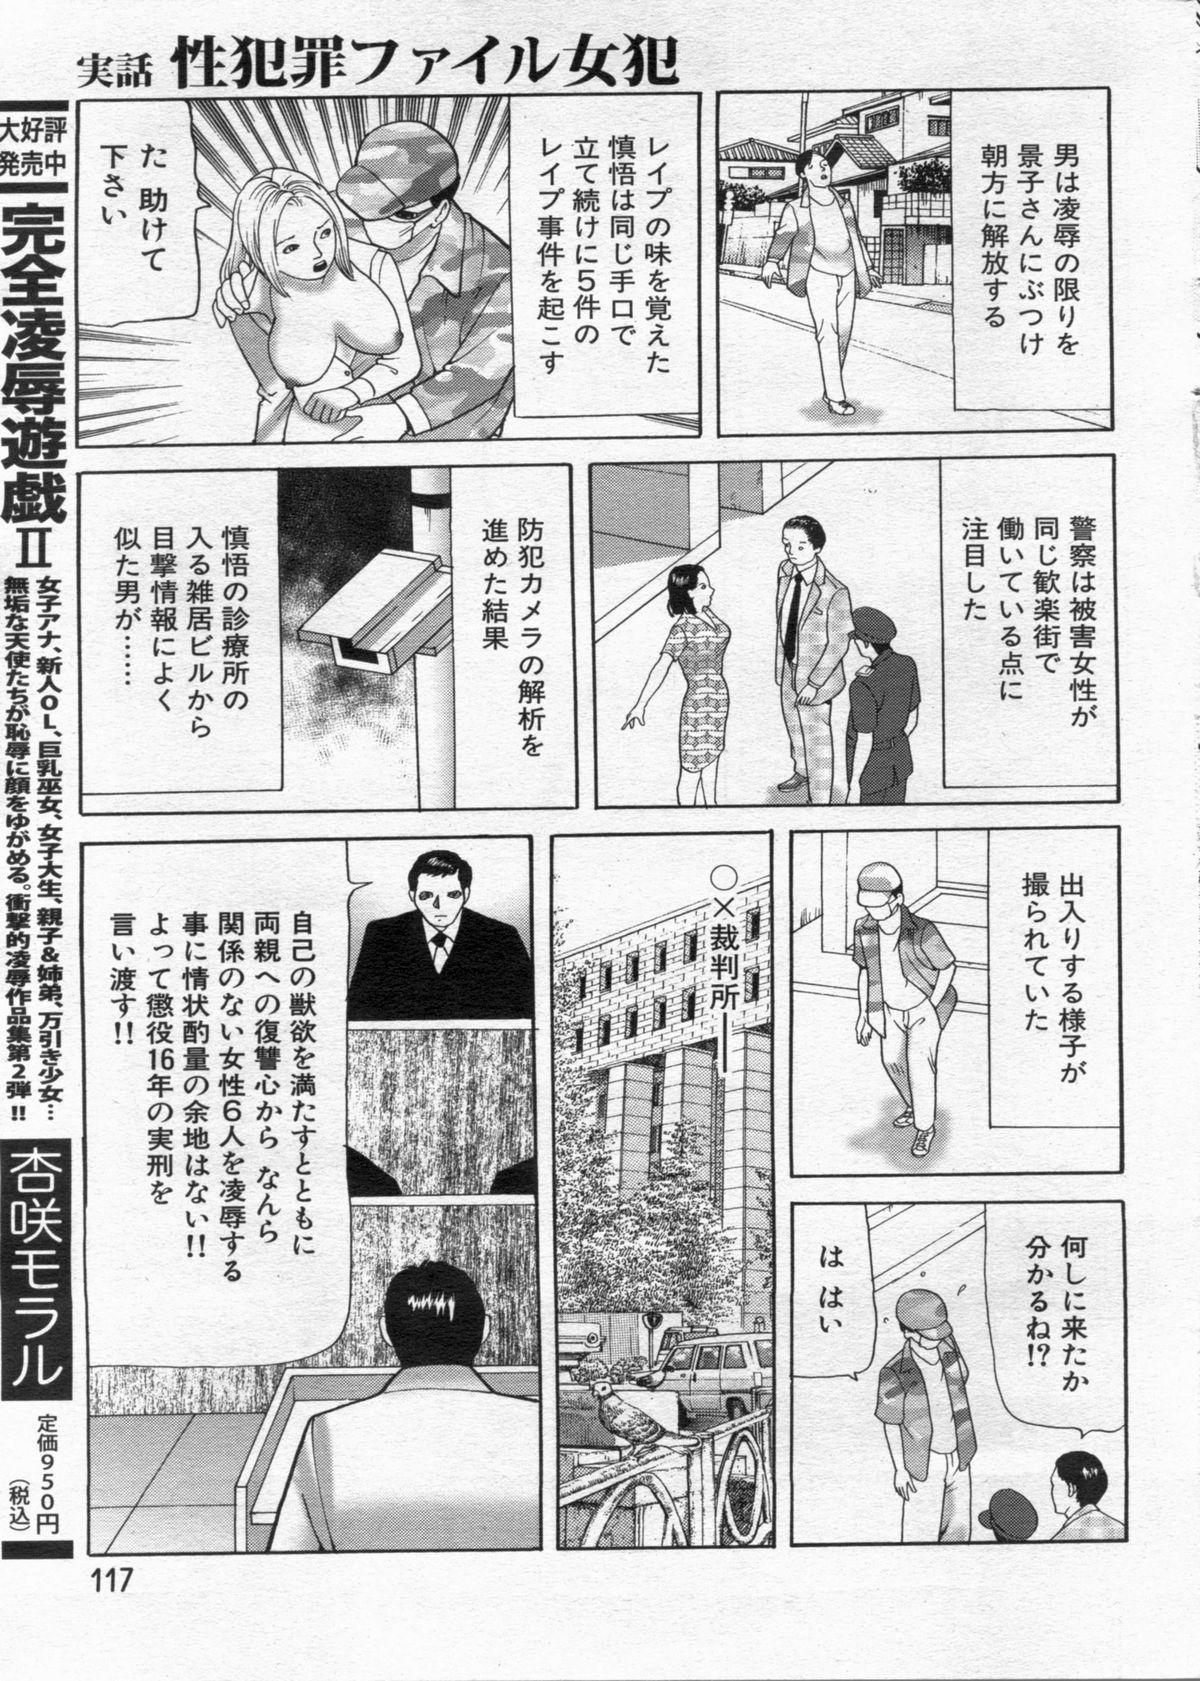 Manga Bon 2013-02 116